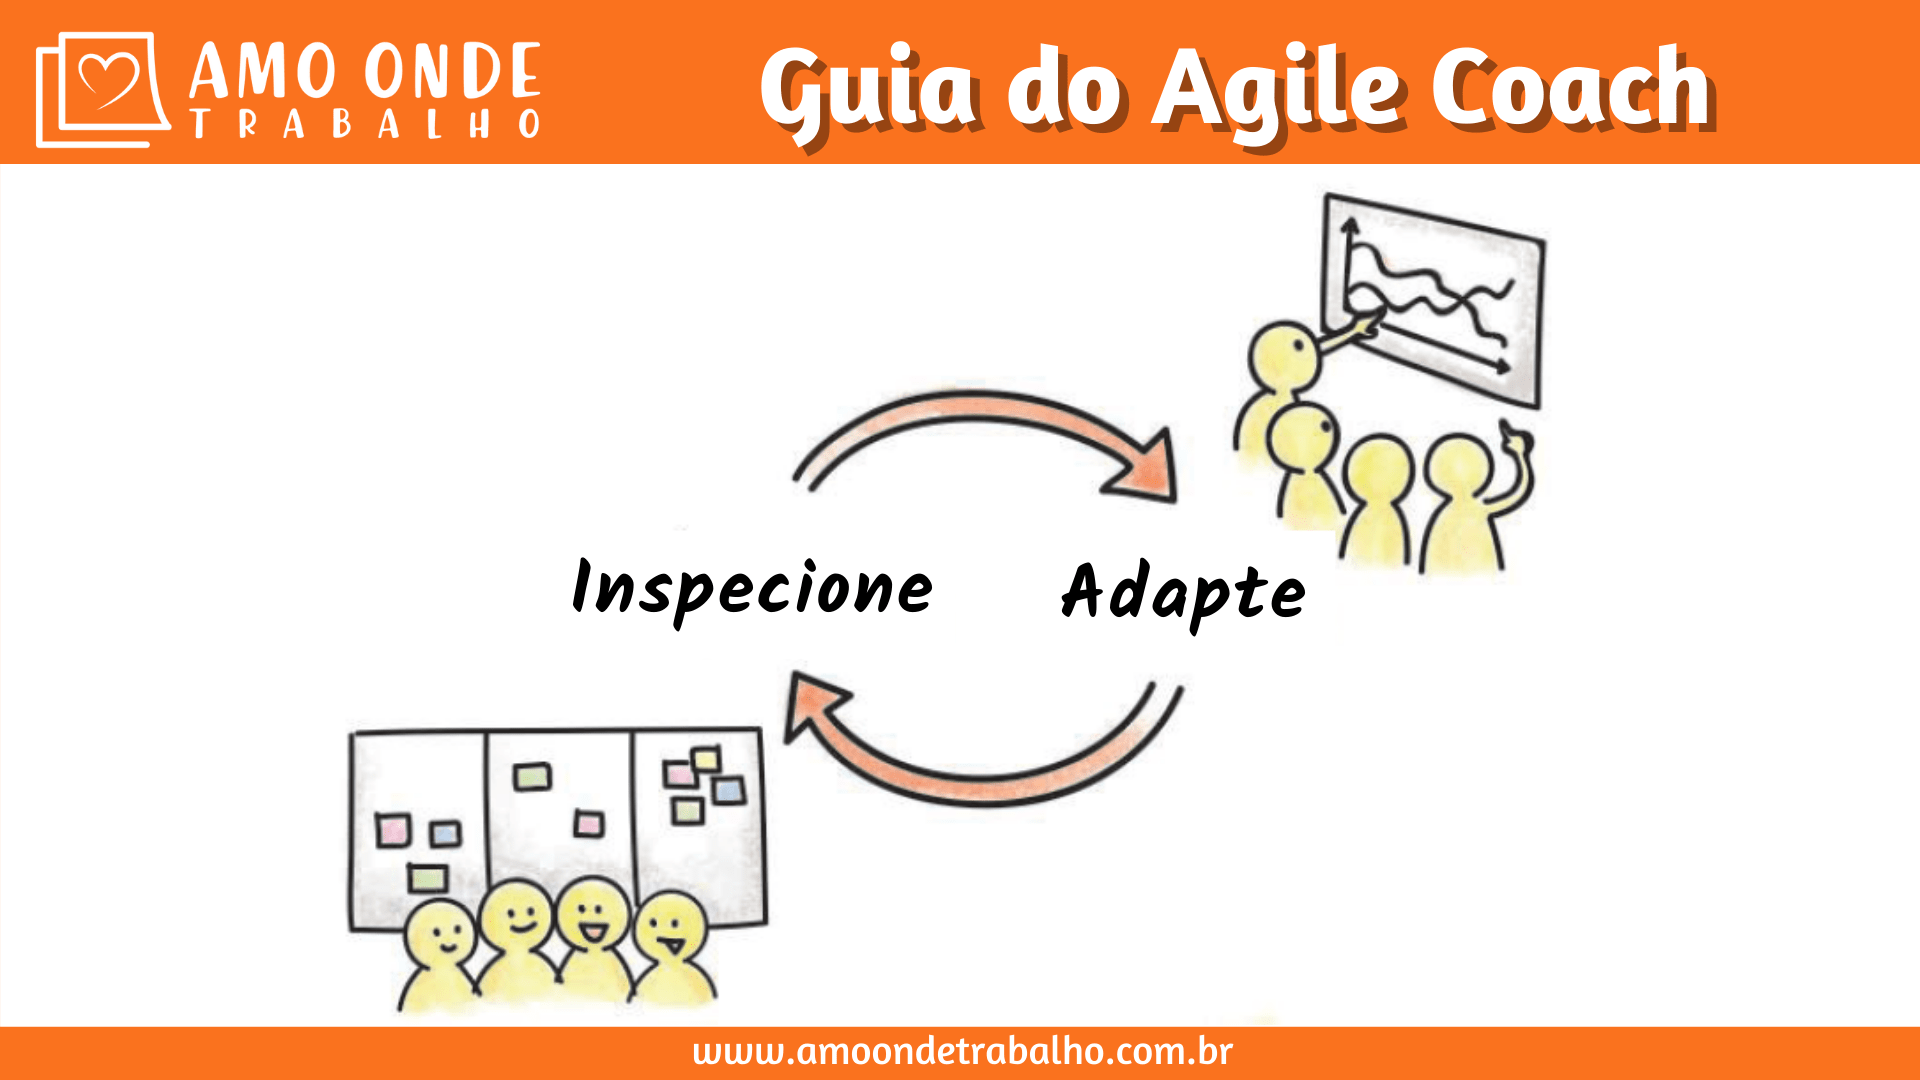 Guia do Agile Coach - Inspecione Adapte